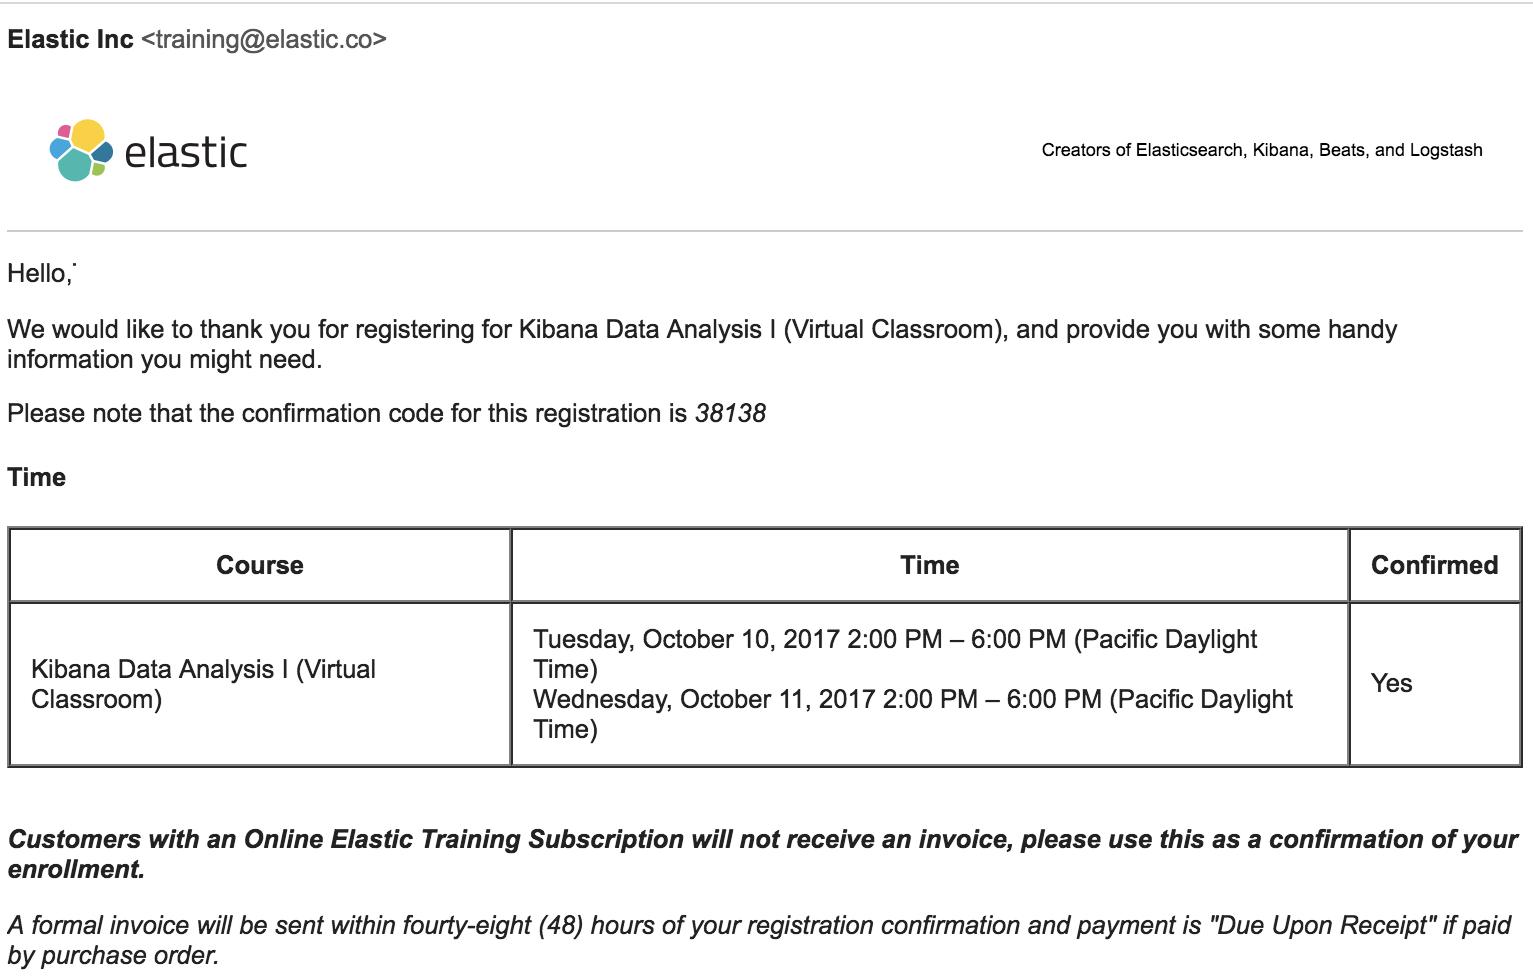 Screenshot: Registration Confirmation